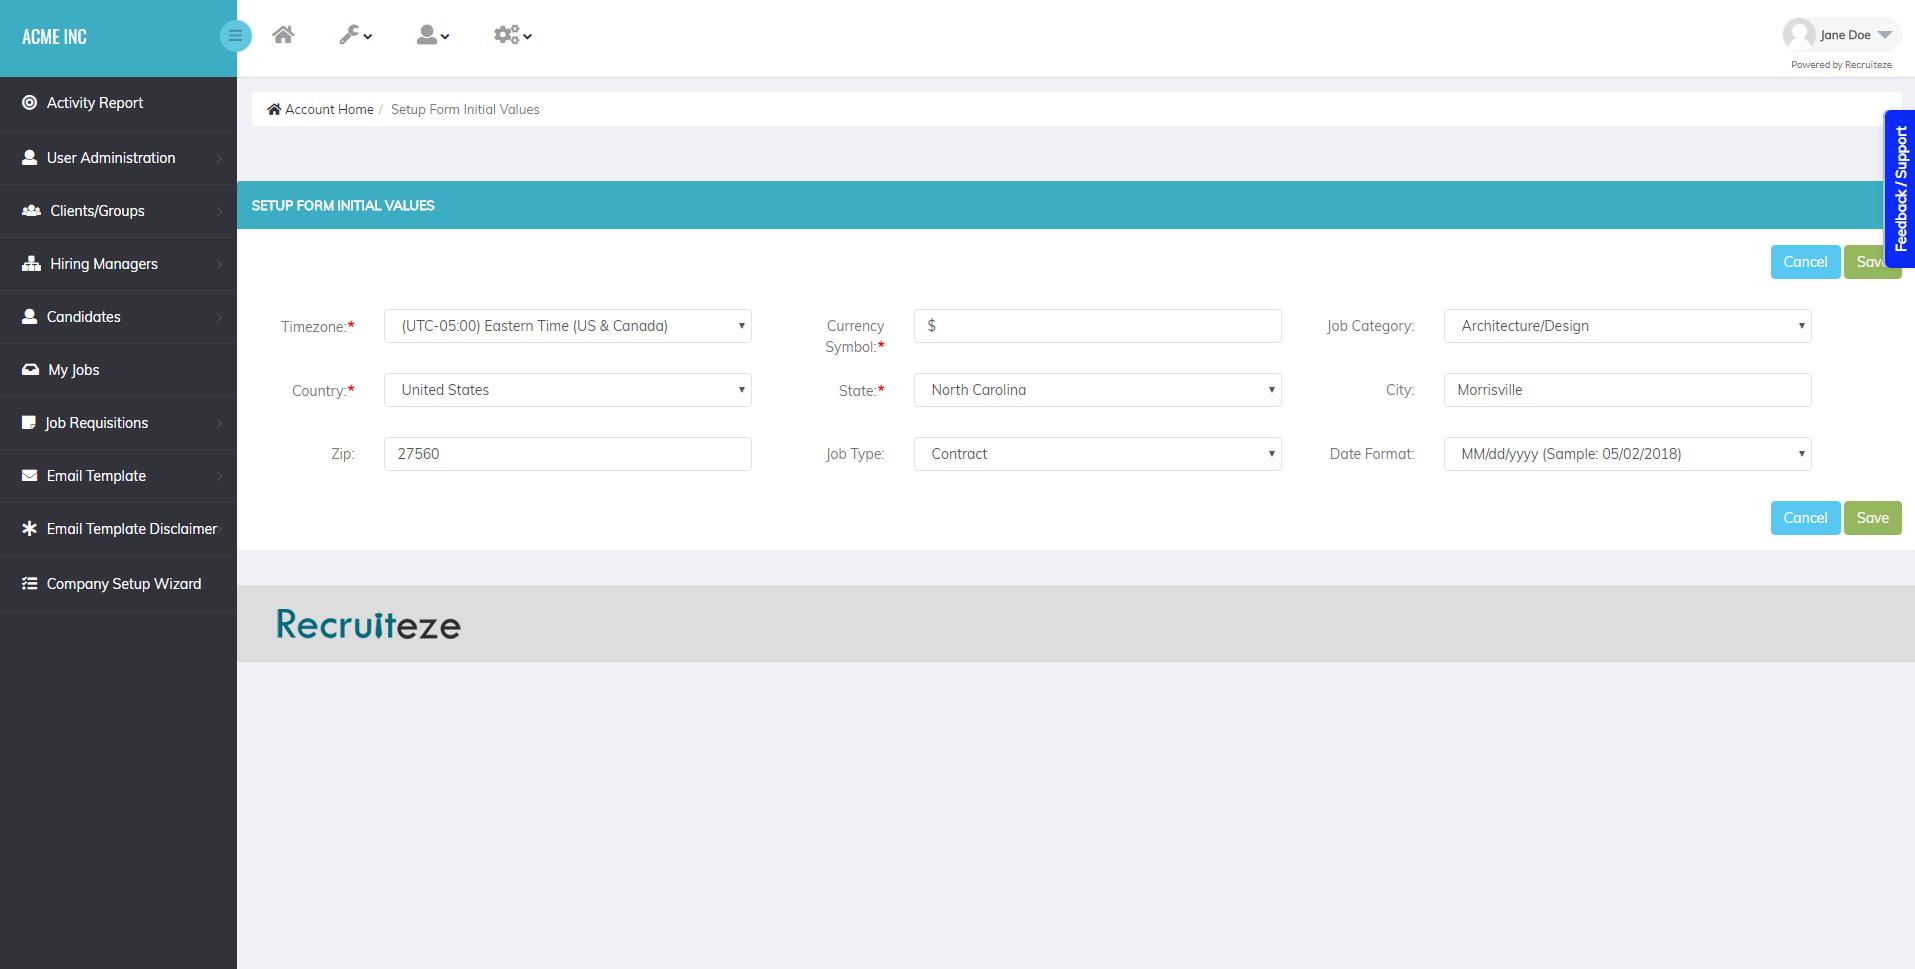 Recruiteze Applicant Tracking System - Setup Form Initial Values